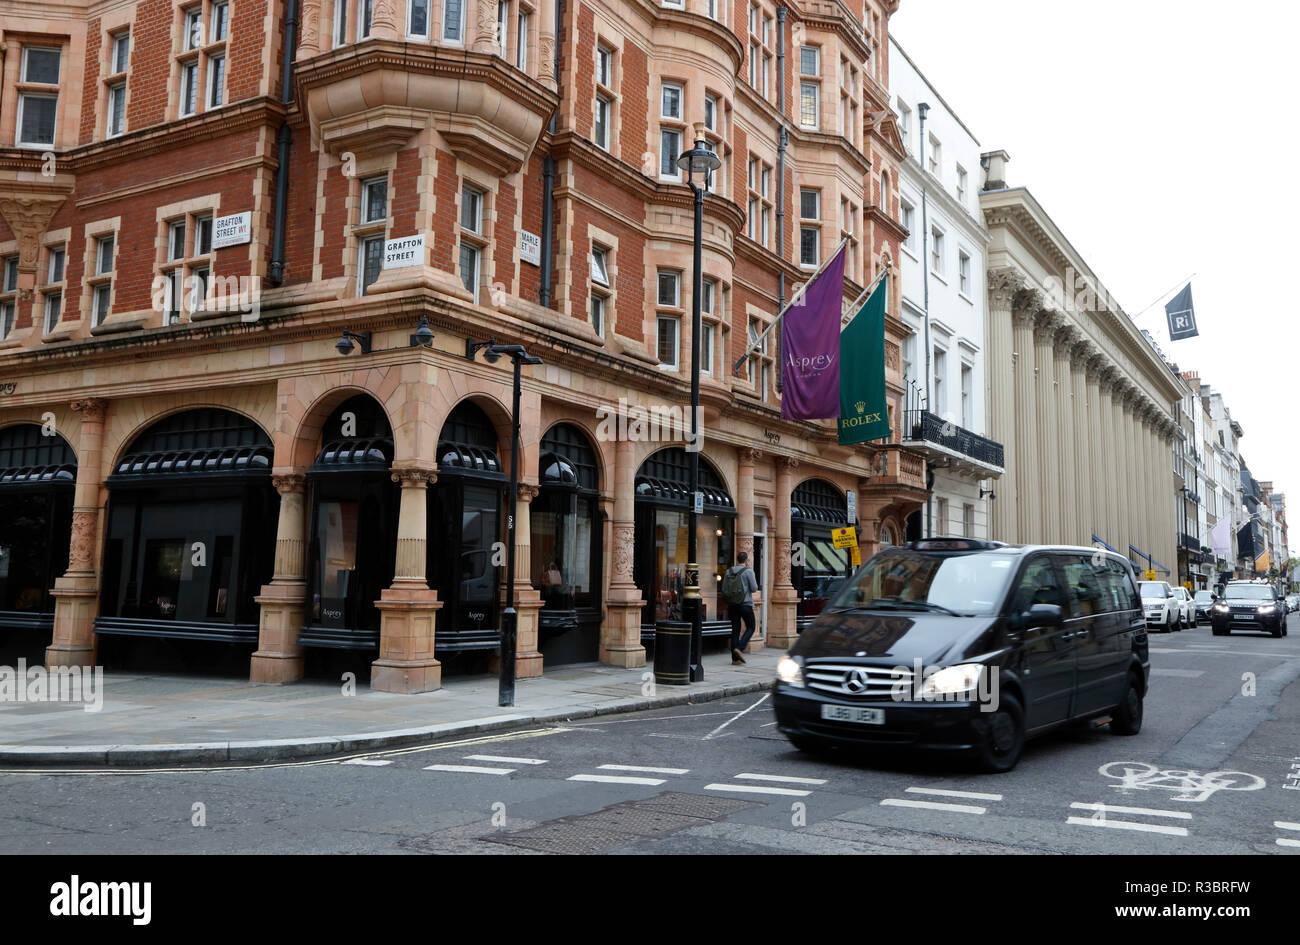 Asprey the Jewellers on corner of Albermarle Street and Grafton Street, Mayfair, London, UK - Stock Image